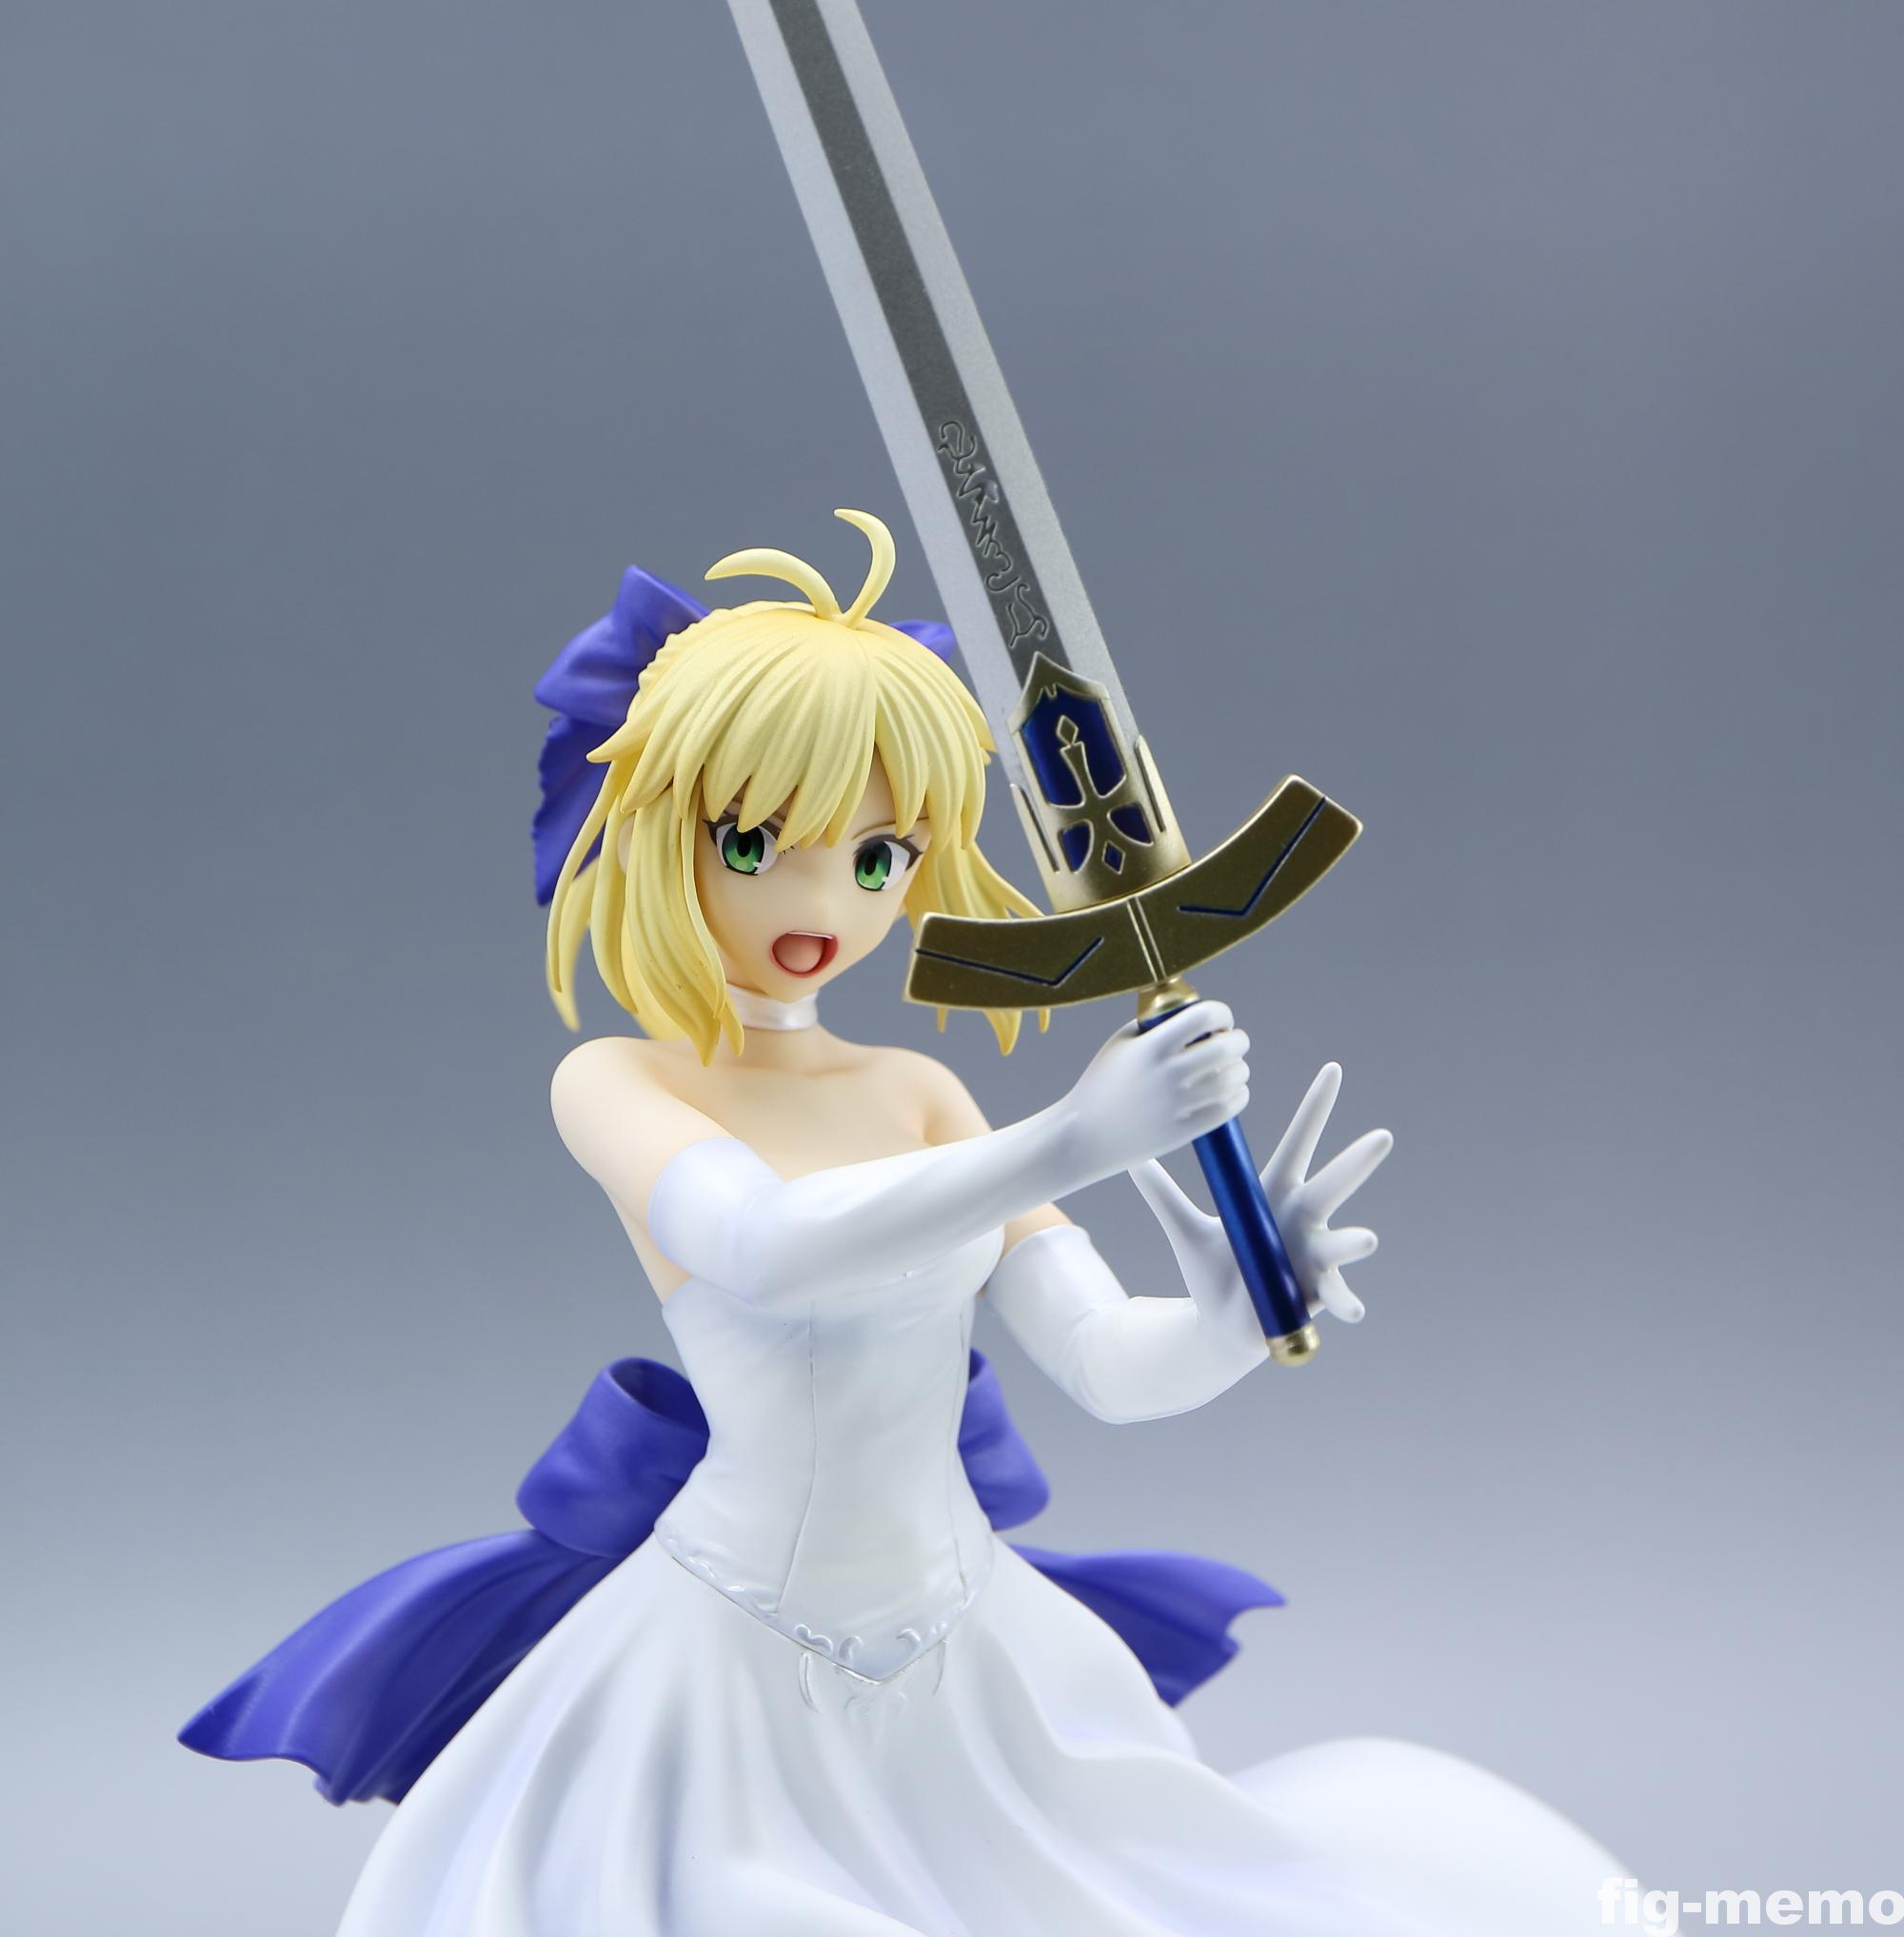 free6 - 【レビュー】ベルファイン「Fate/staynight [Unlimited Blade Works] セイバー 白ドレスVer.」